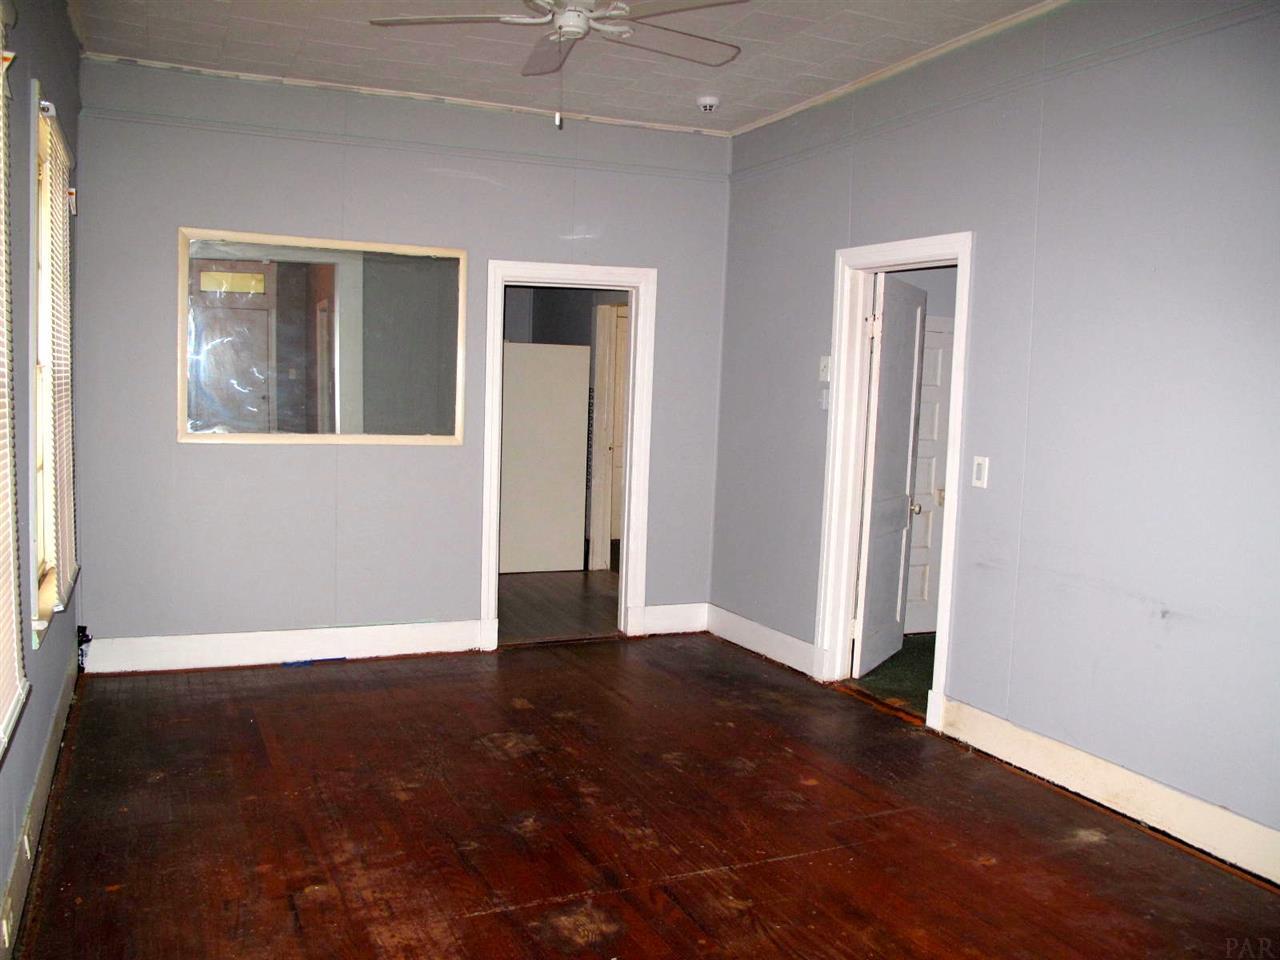 2008 N 8th Ave, Pensacola, FL 32503